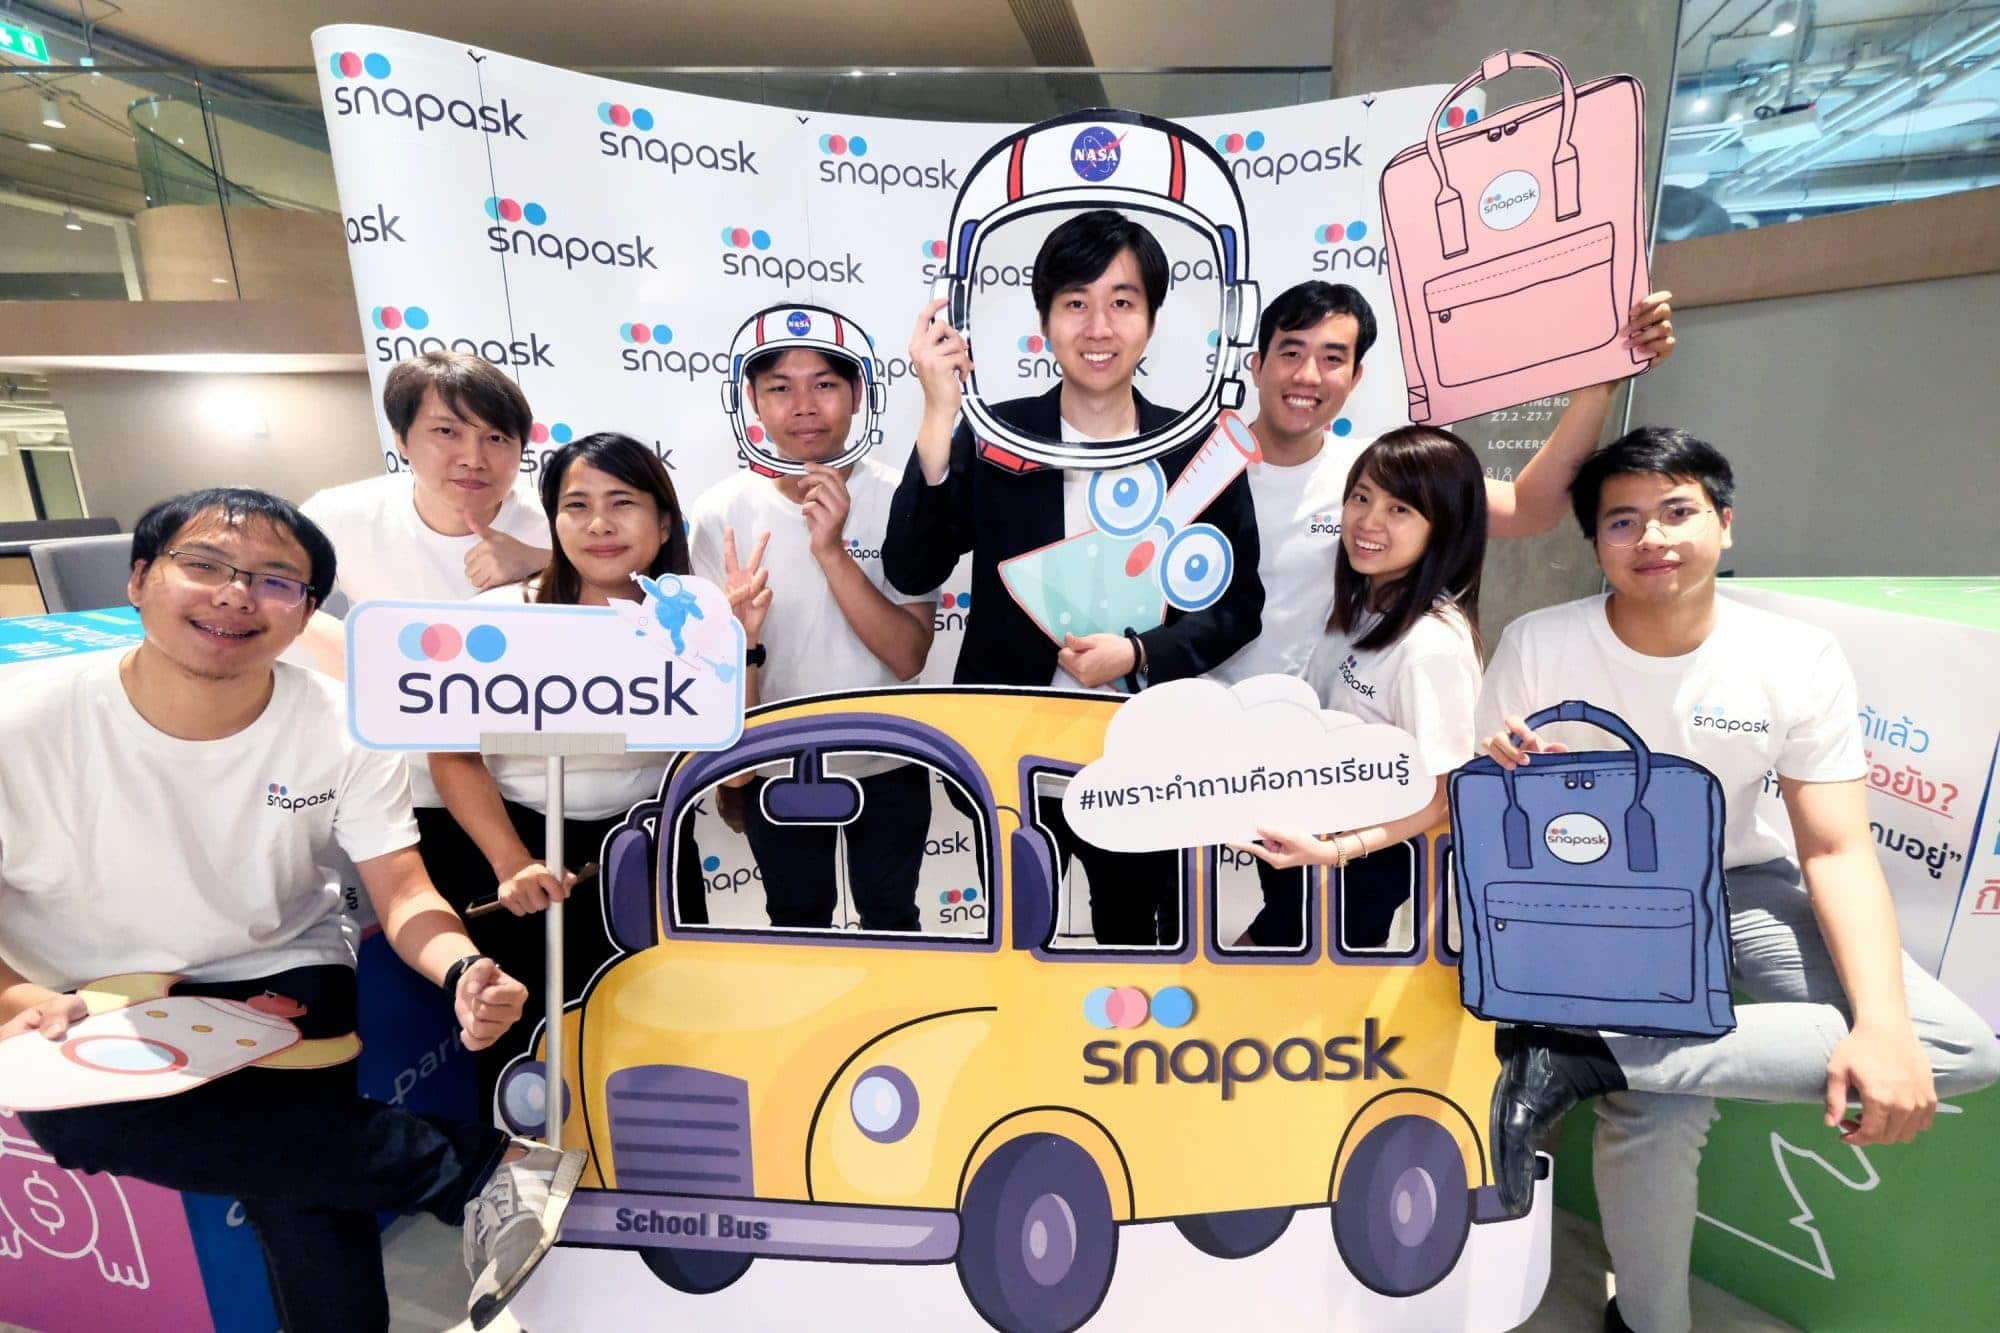 - Snapask team 1 - Snapask New Gen Dream เผย 3 ฟีเจอร์ใหม่ เพื่อเด็กรักเรียน